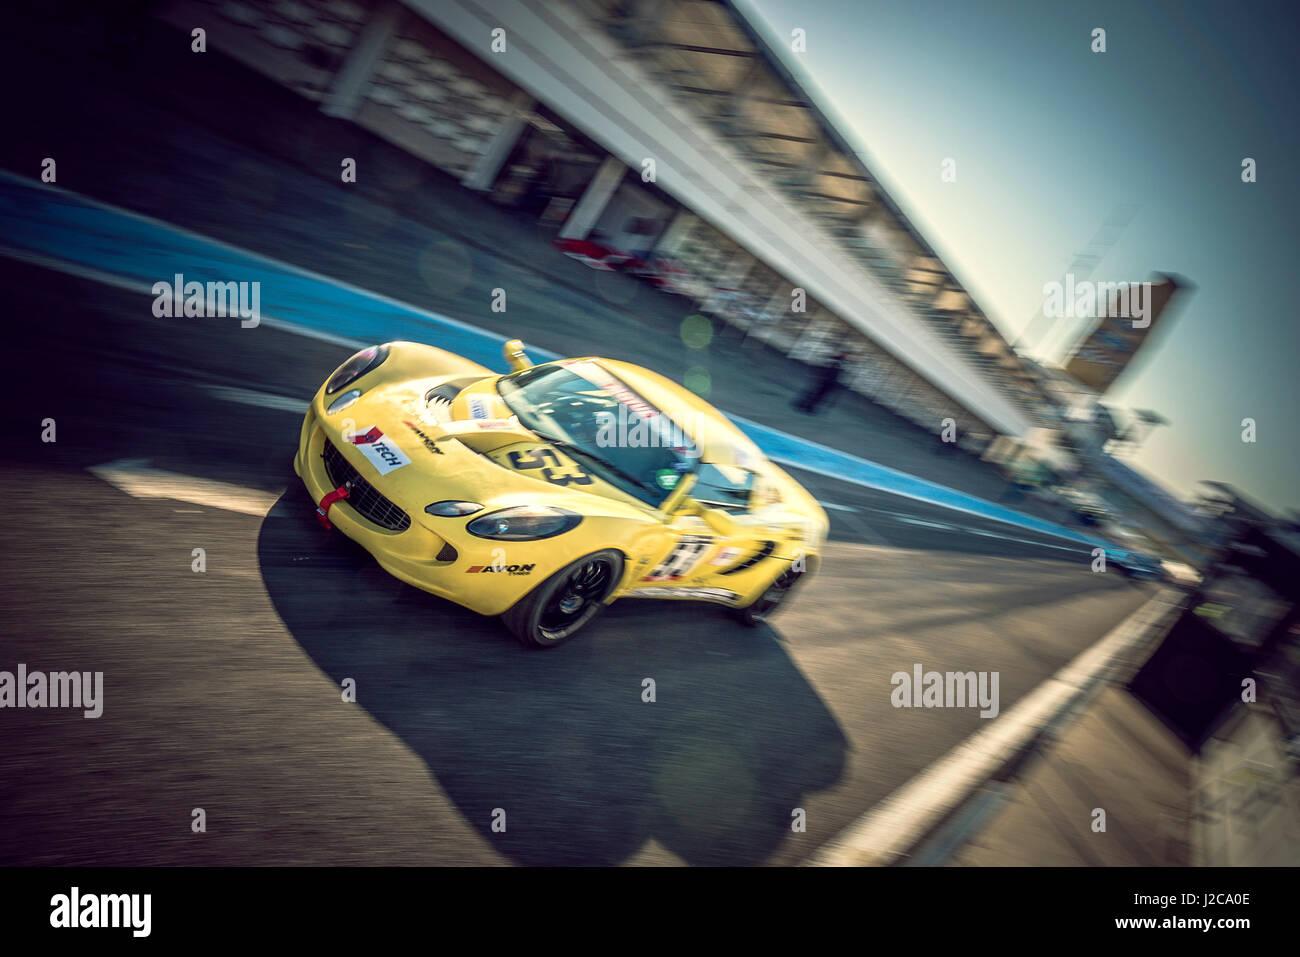 Lotus Elise Racing Car - Car Race - Stock Image